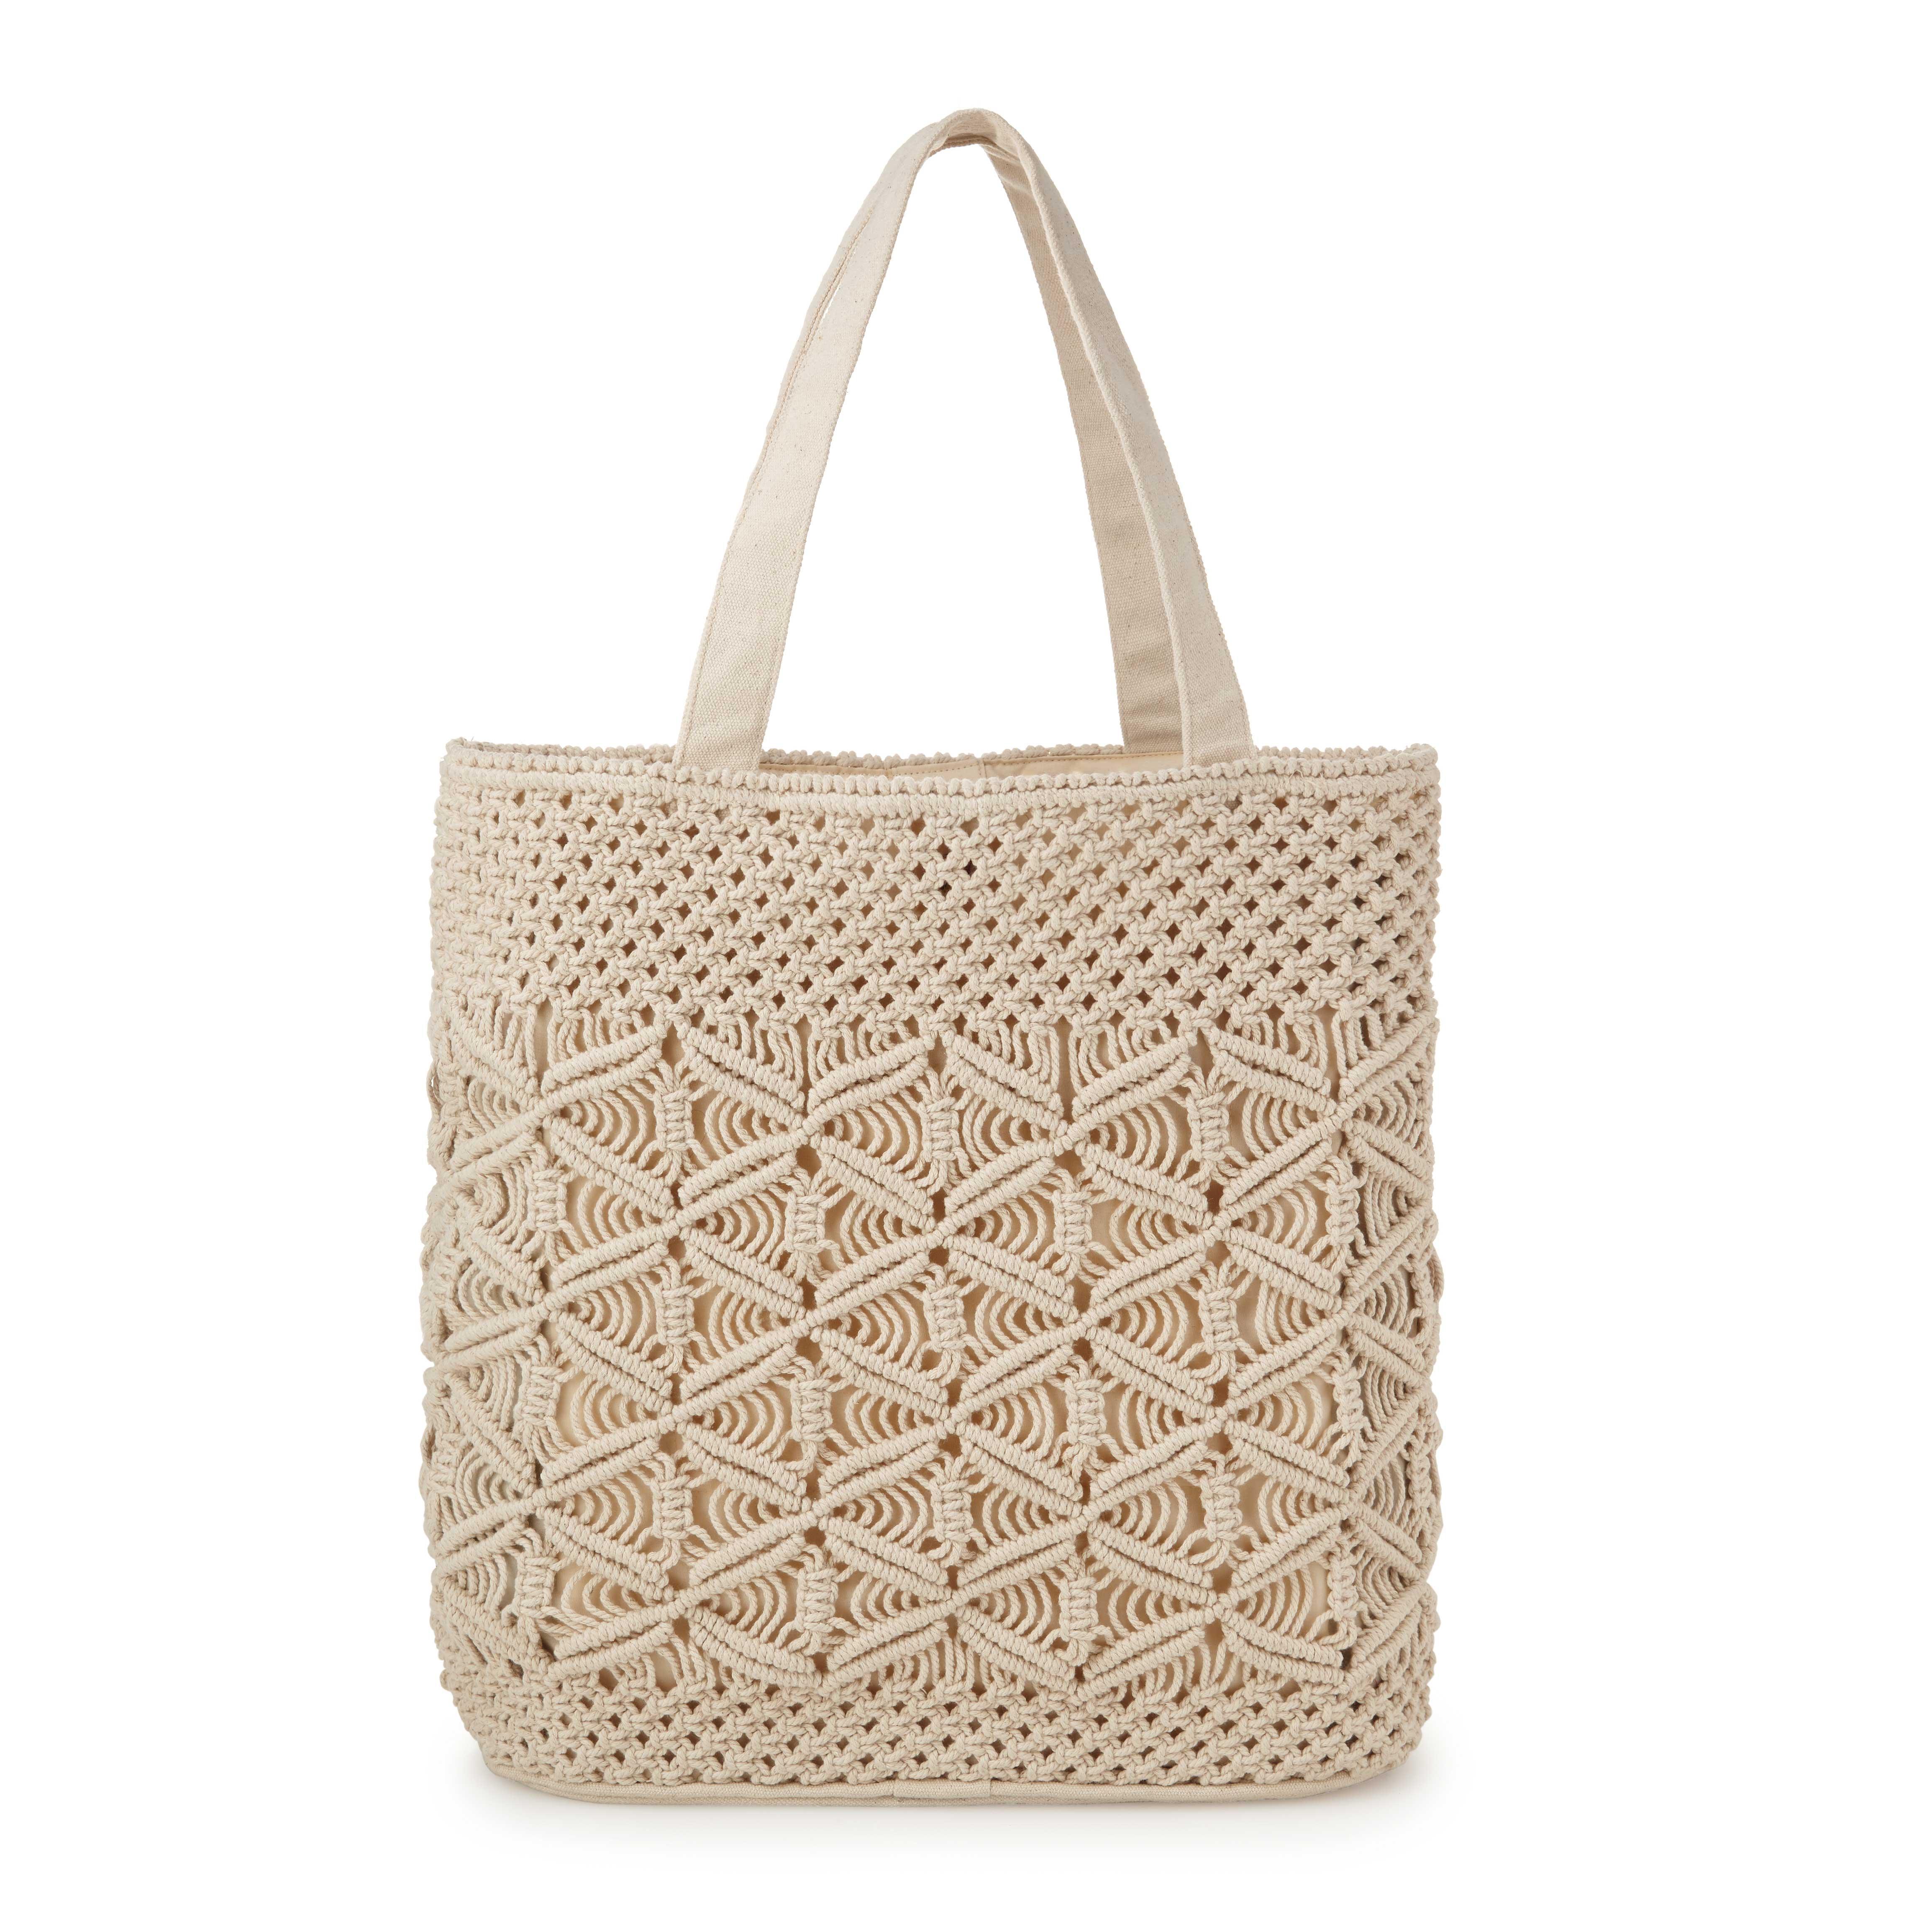 Handmade Macrame Tote Macrame Bag Uncommongoods